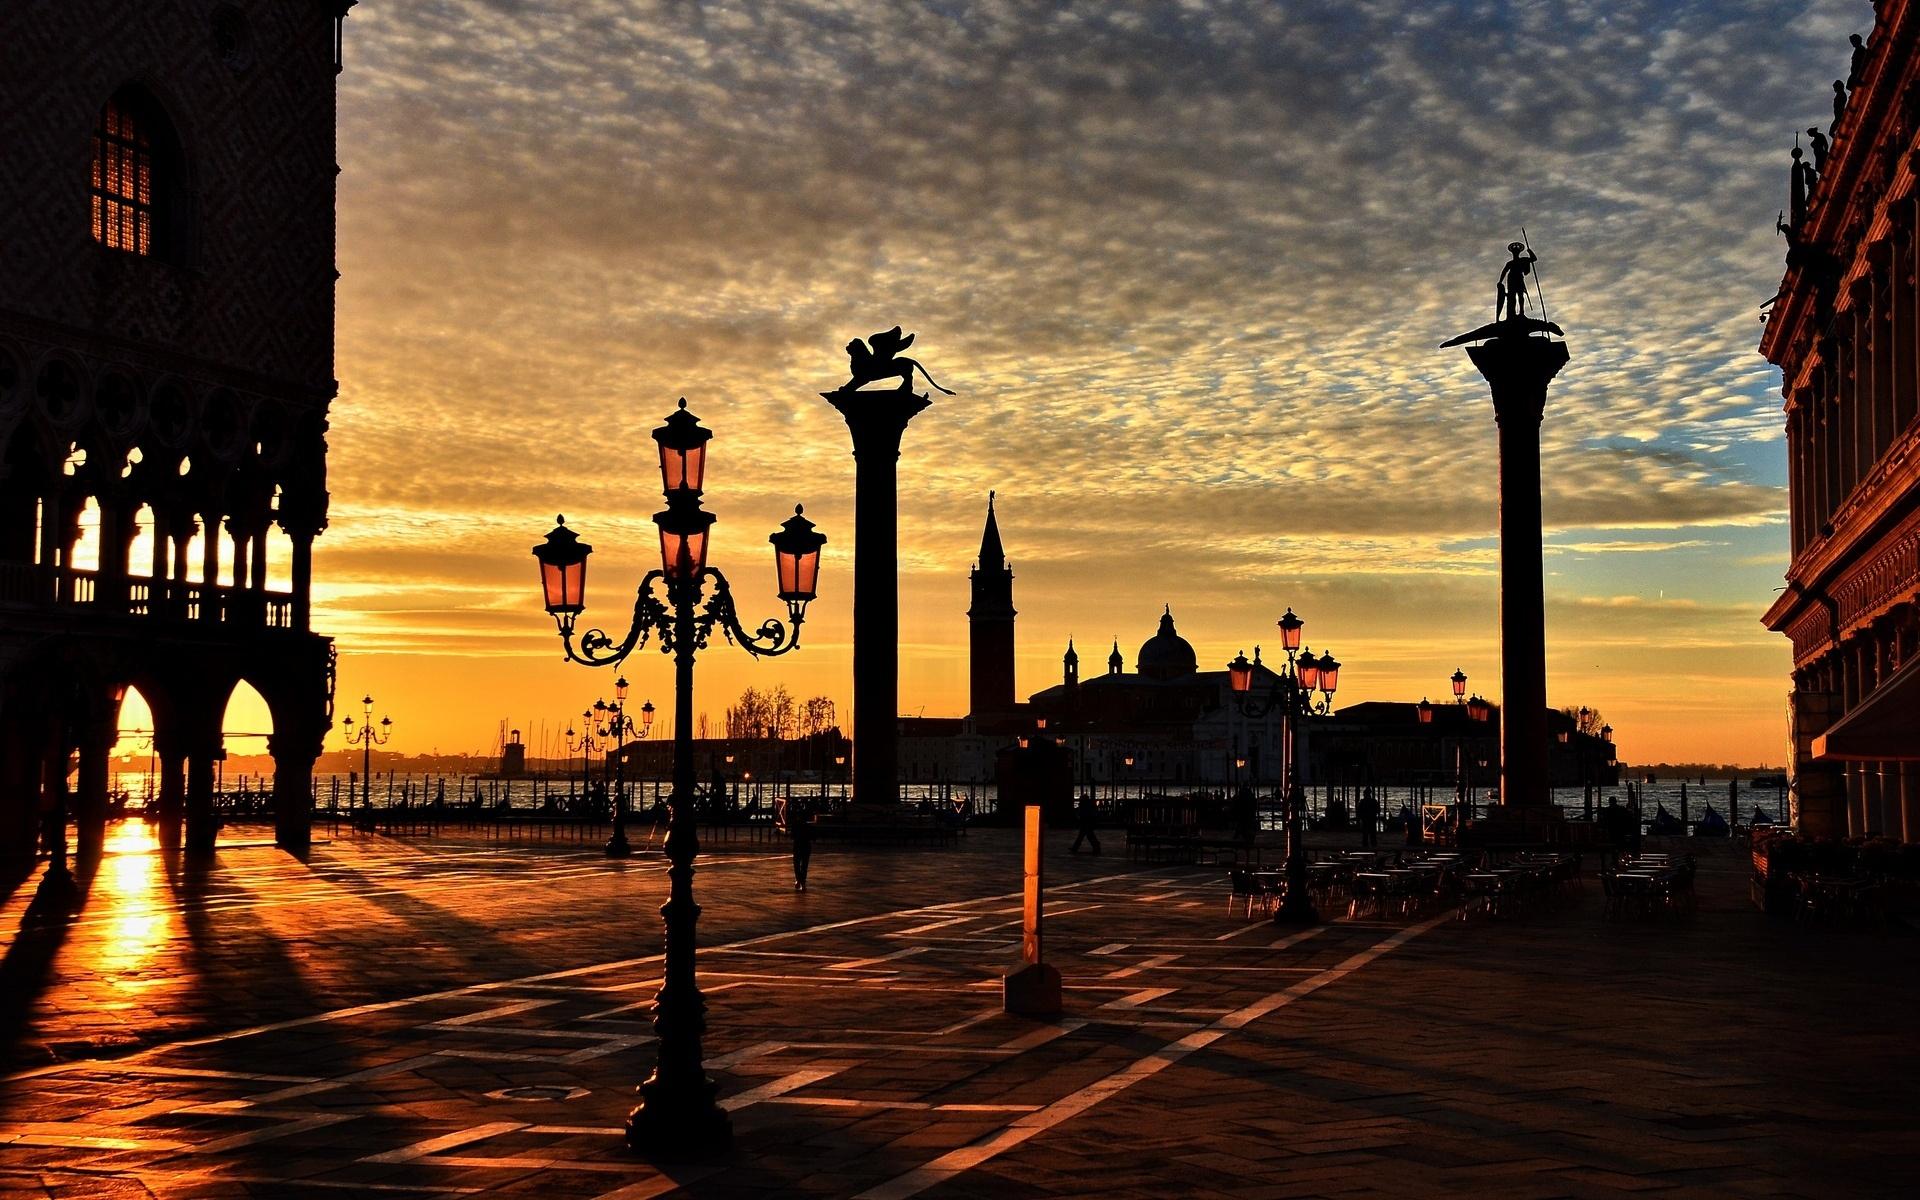 Street italia lantern venezia lights city italy wallpaper 1920x1200